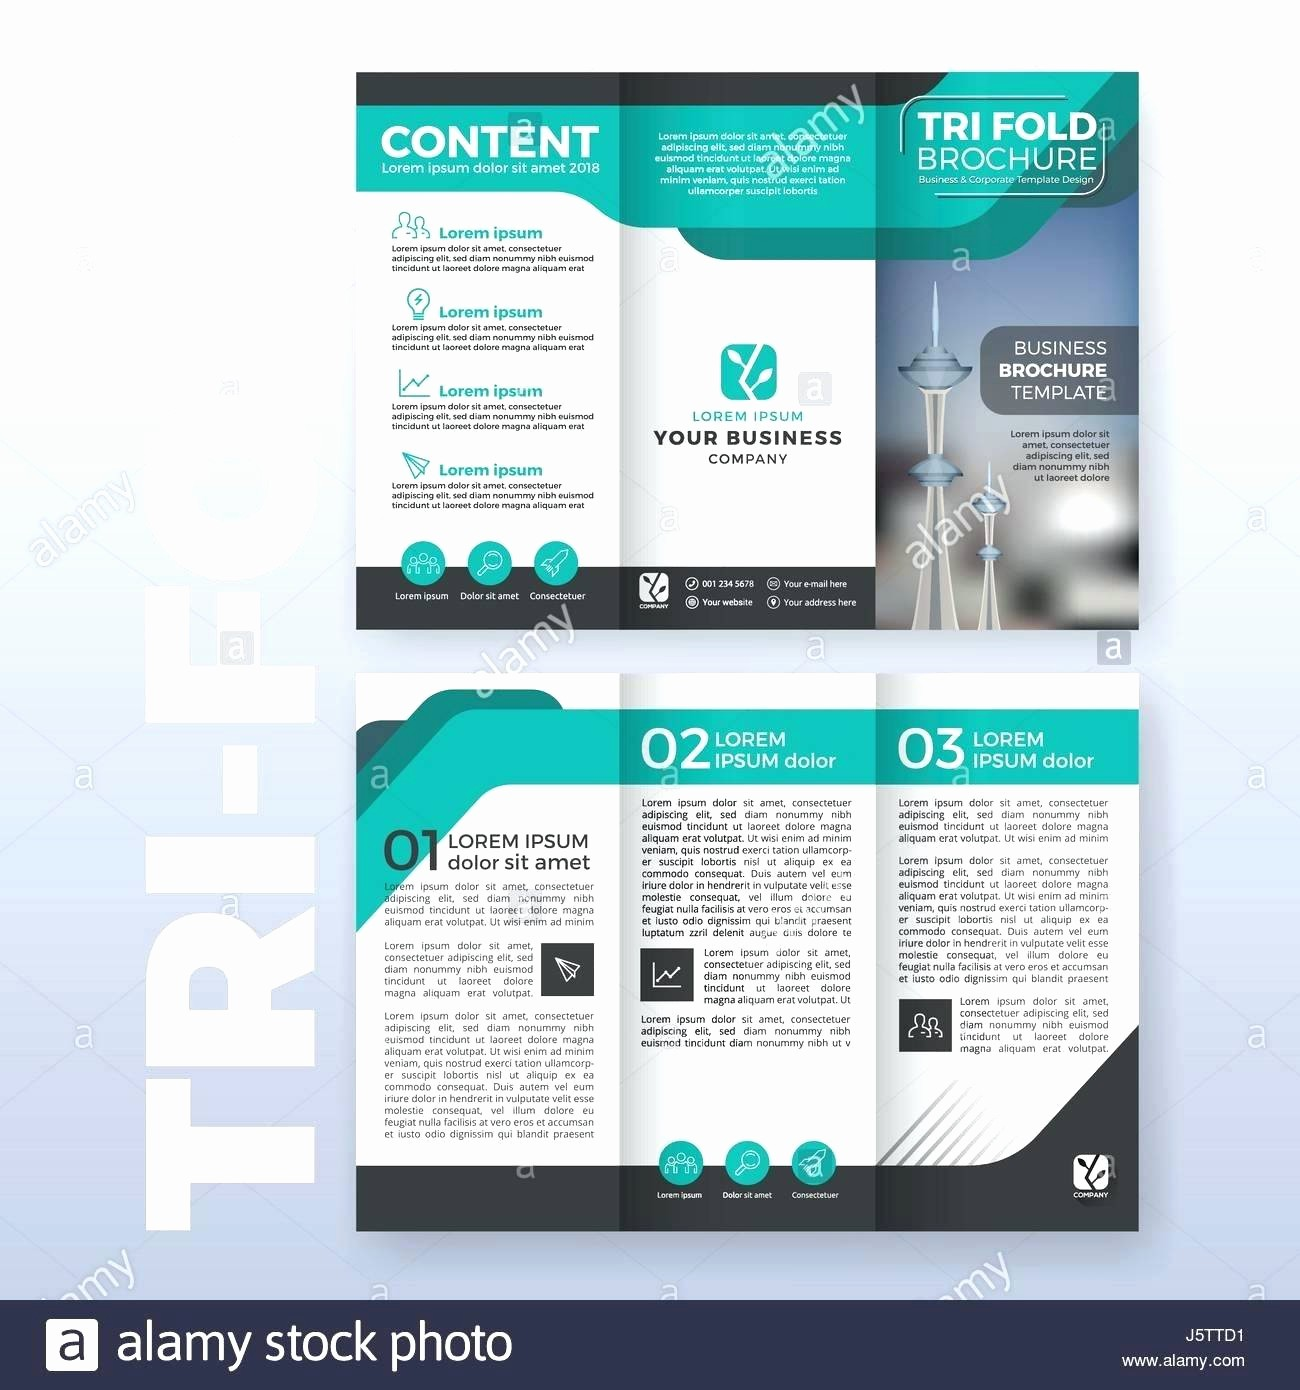 Size Of Tri Fold Brochure Inspirational Legal Size Tri Fold Brochure Template